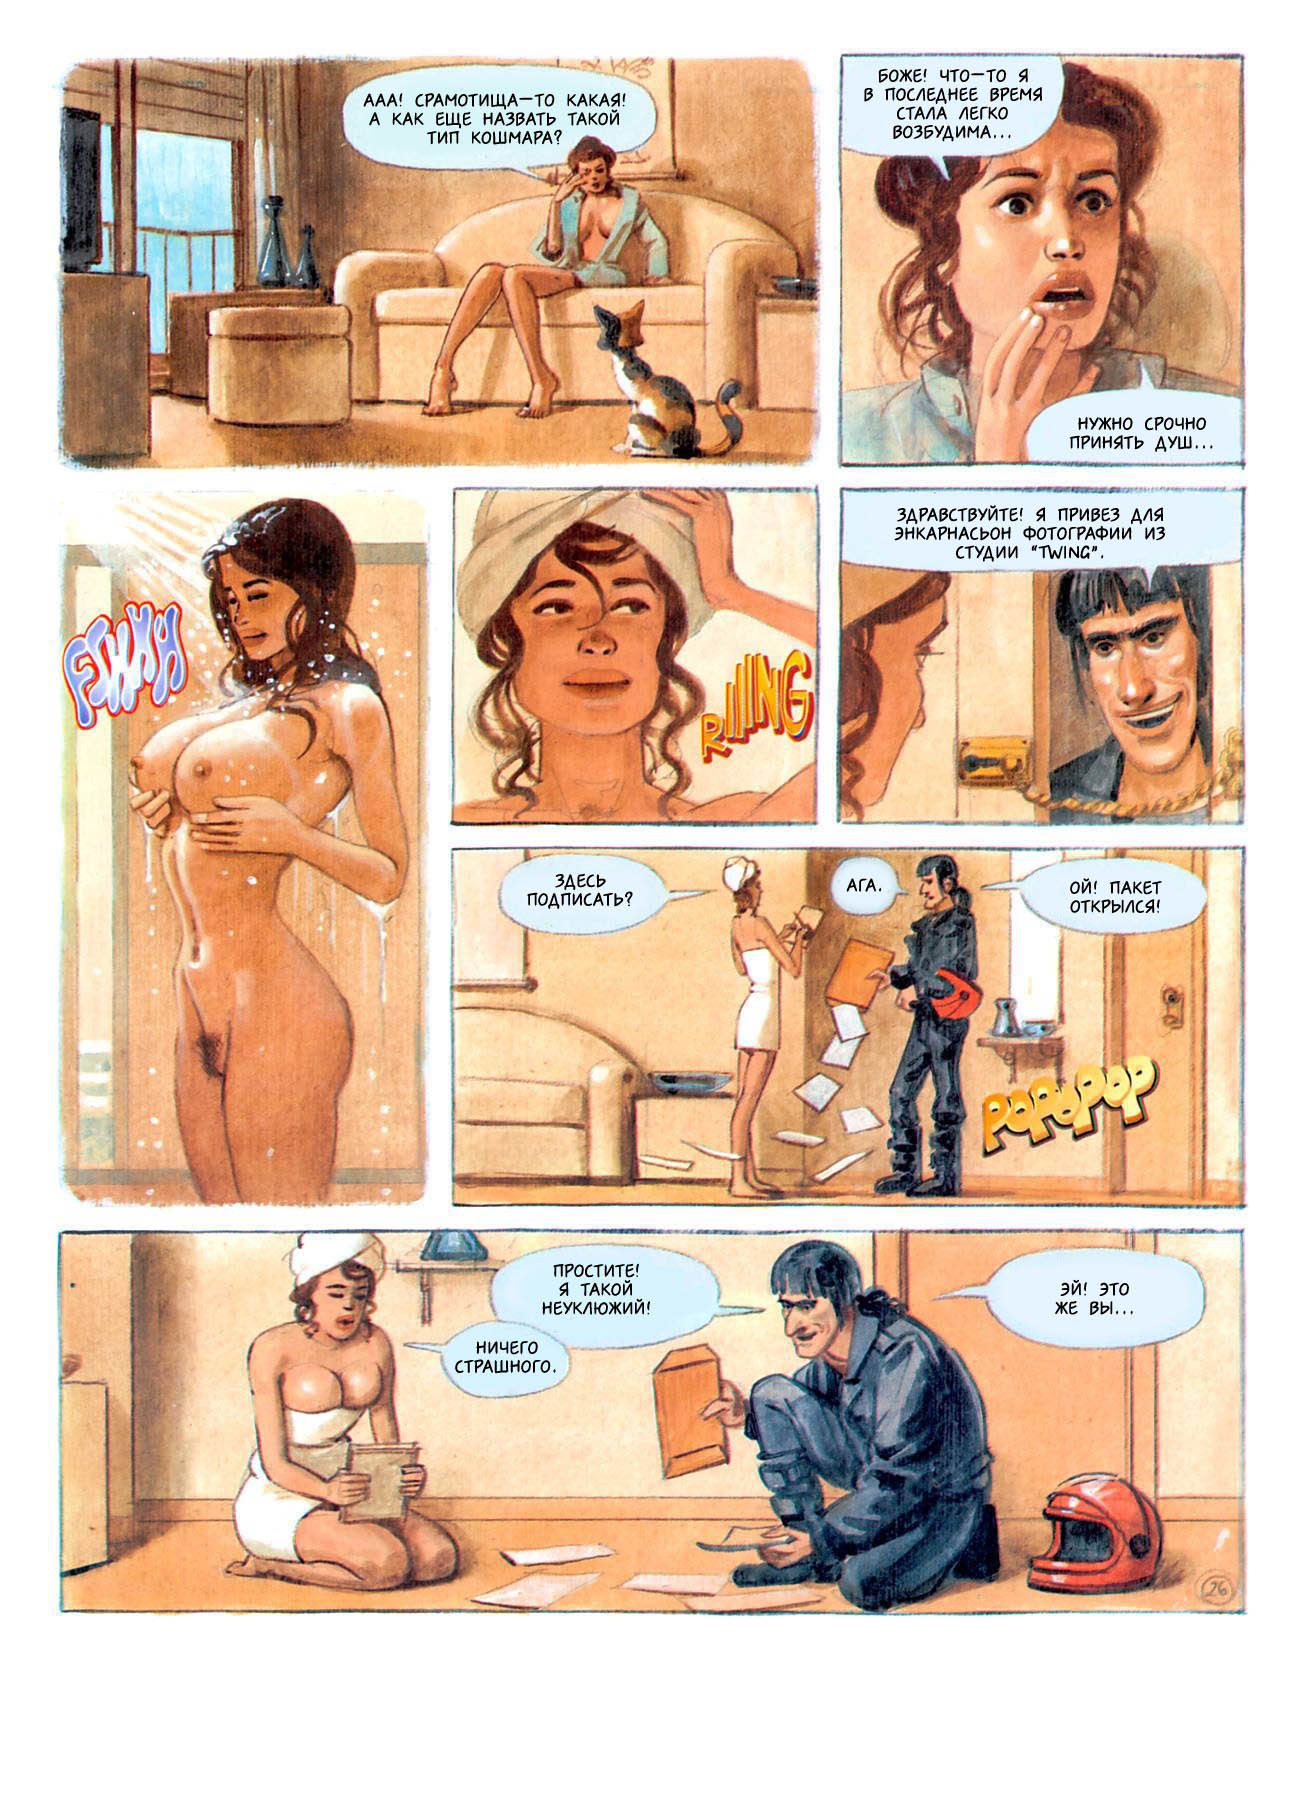 porno-doktor-retro-filmi